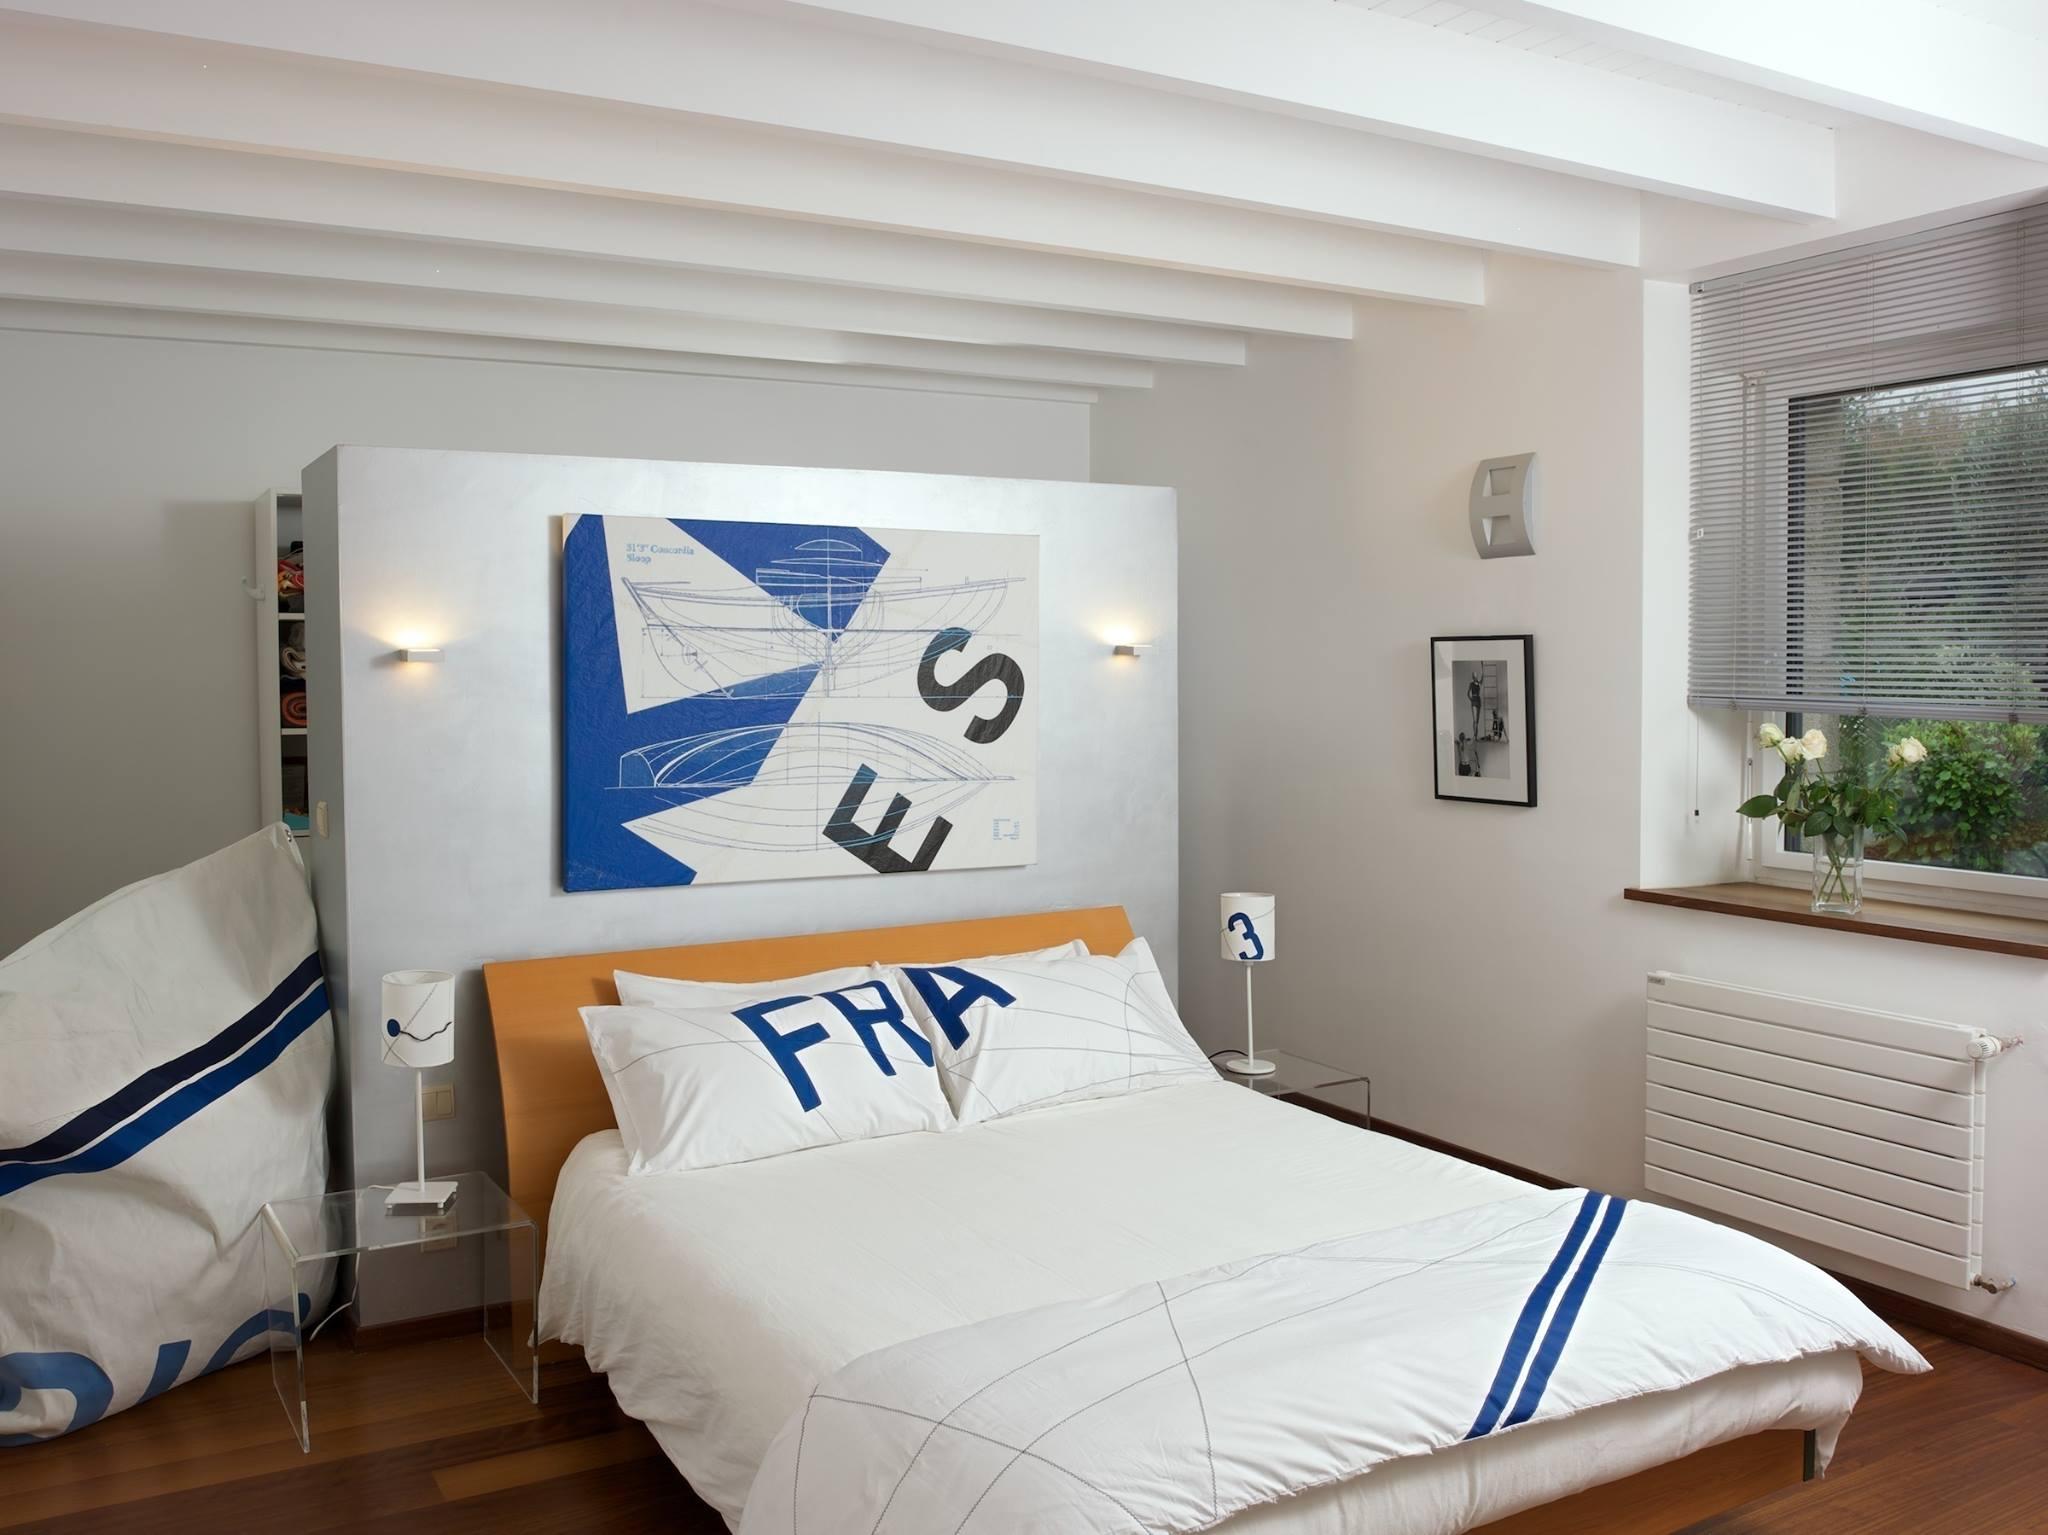 b o carr chemin de lit matelas en percale de coton style bord de mer. Black Bedroom Furniture Sets. Home Design Ideas